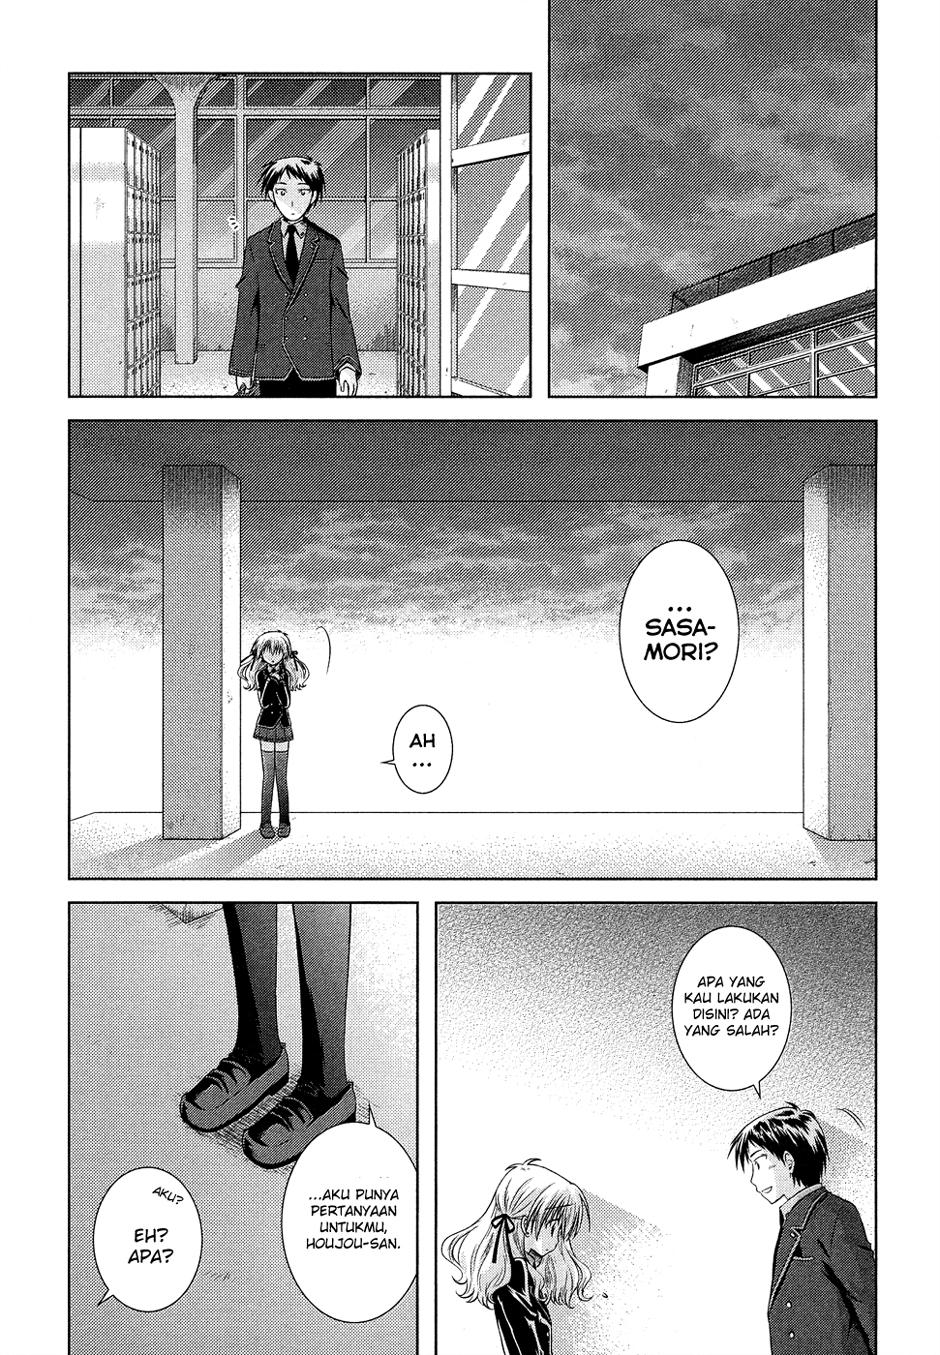 Komik iris zero 011 12 Indonesia iris zero 011 Terbaru 20 Baca Manga Komik Indonesia 